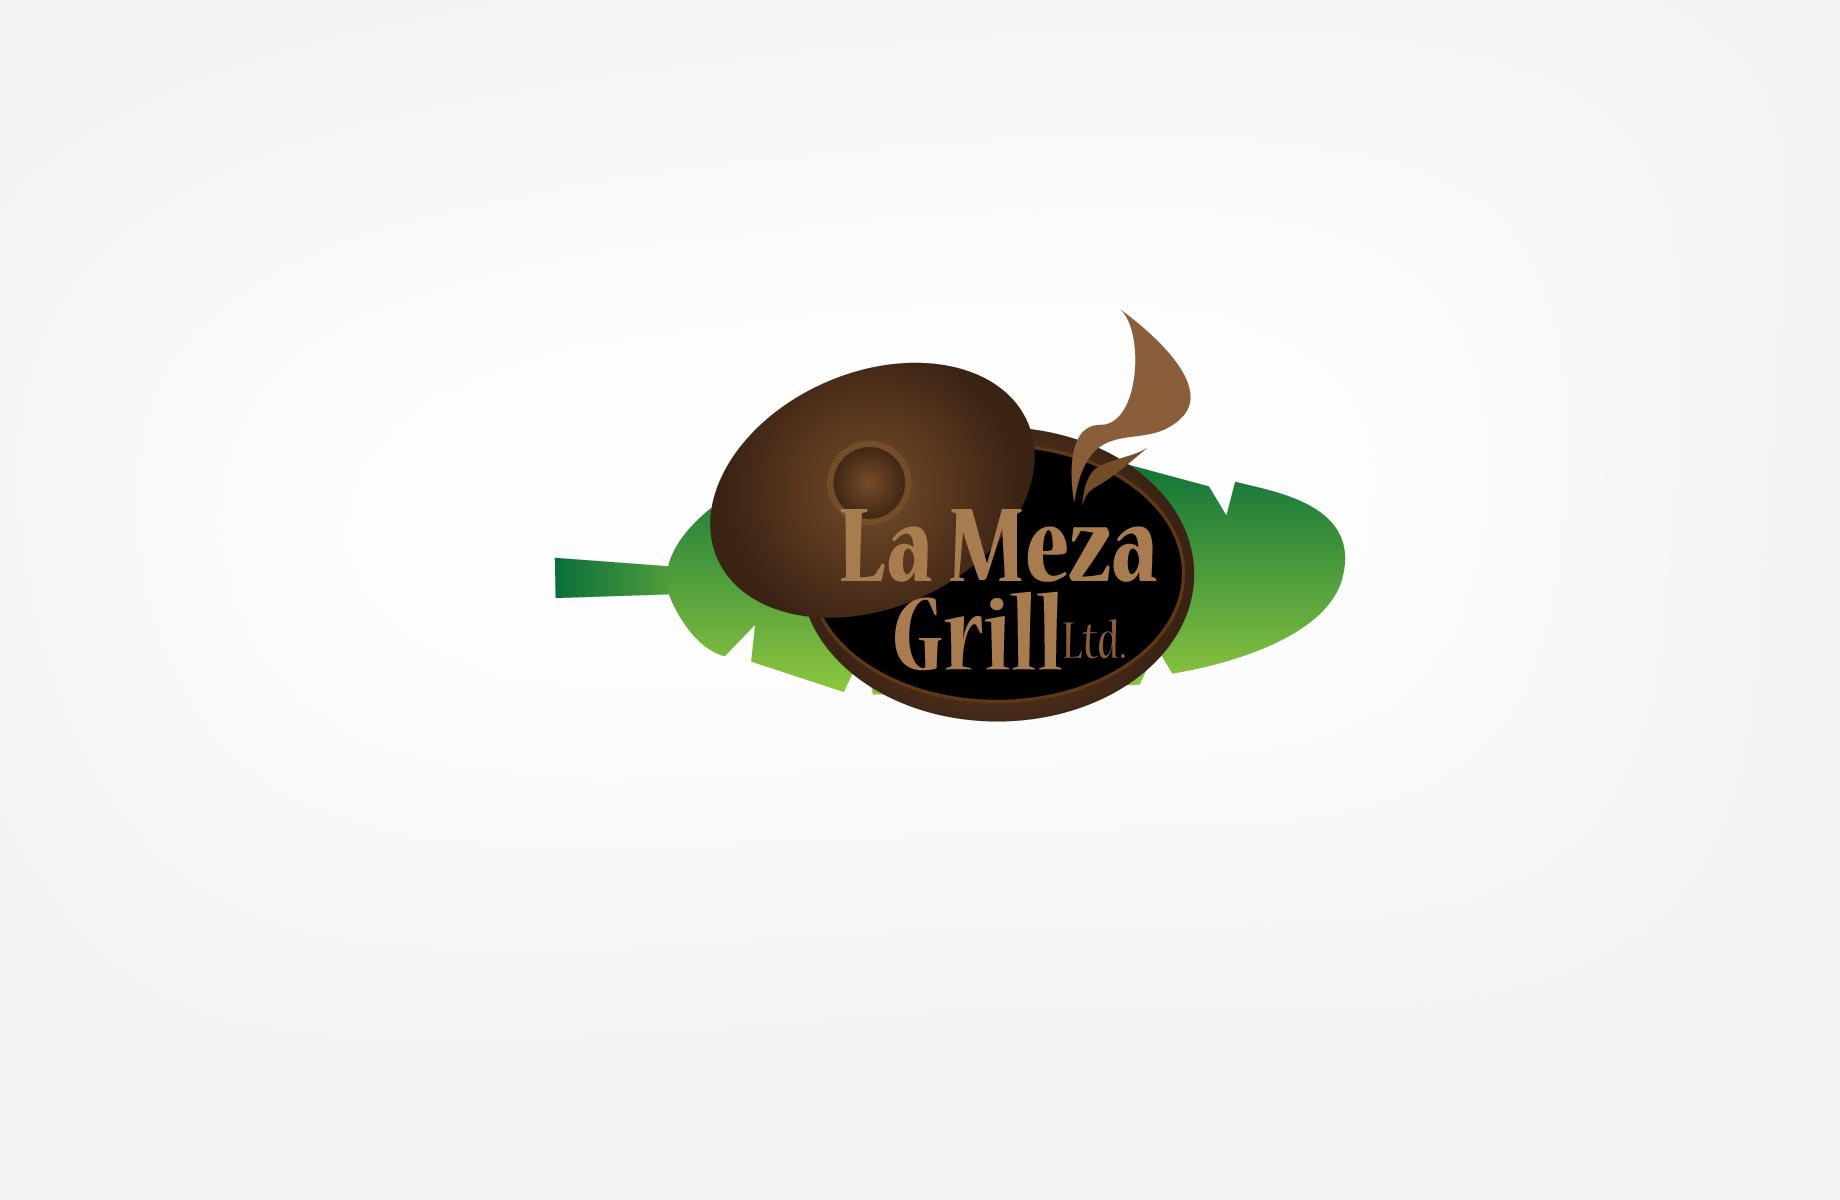 Logo Design by Jan Chua - Entry No. 48 in the Logo Design Contest Inspiring Logo Design for La Meza Grill Ltd..